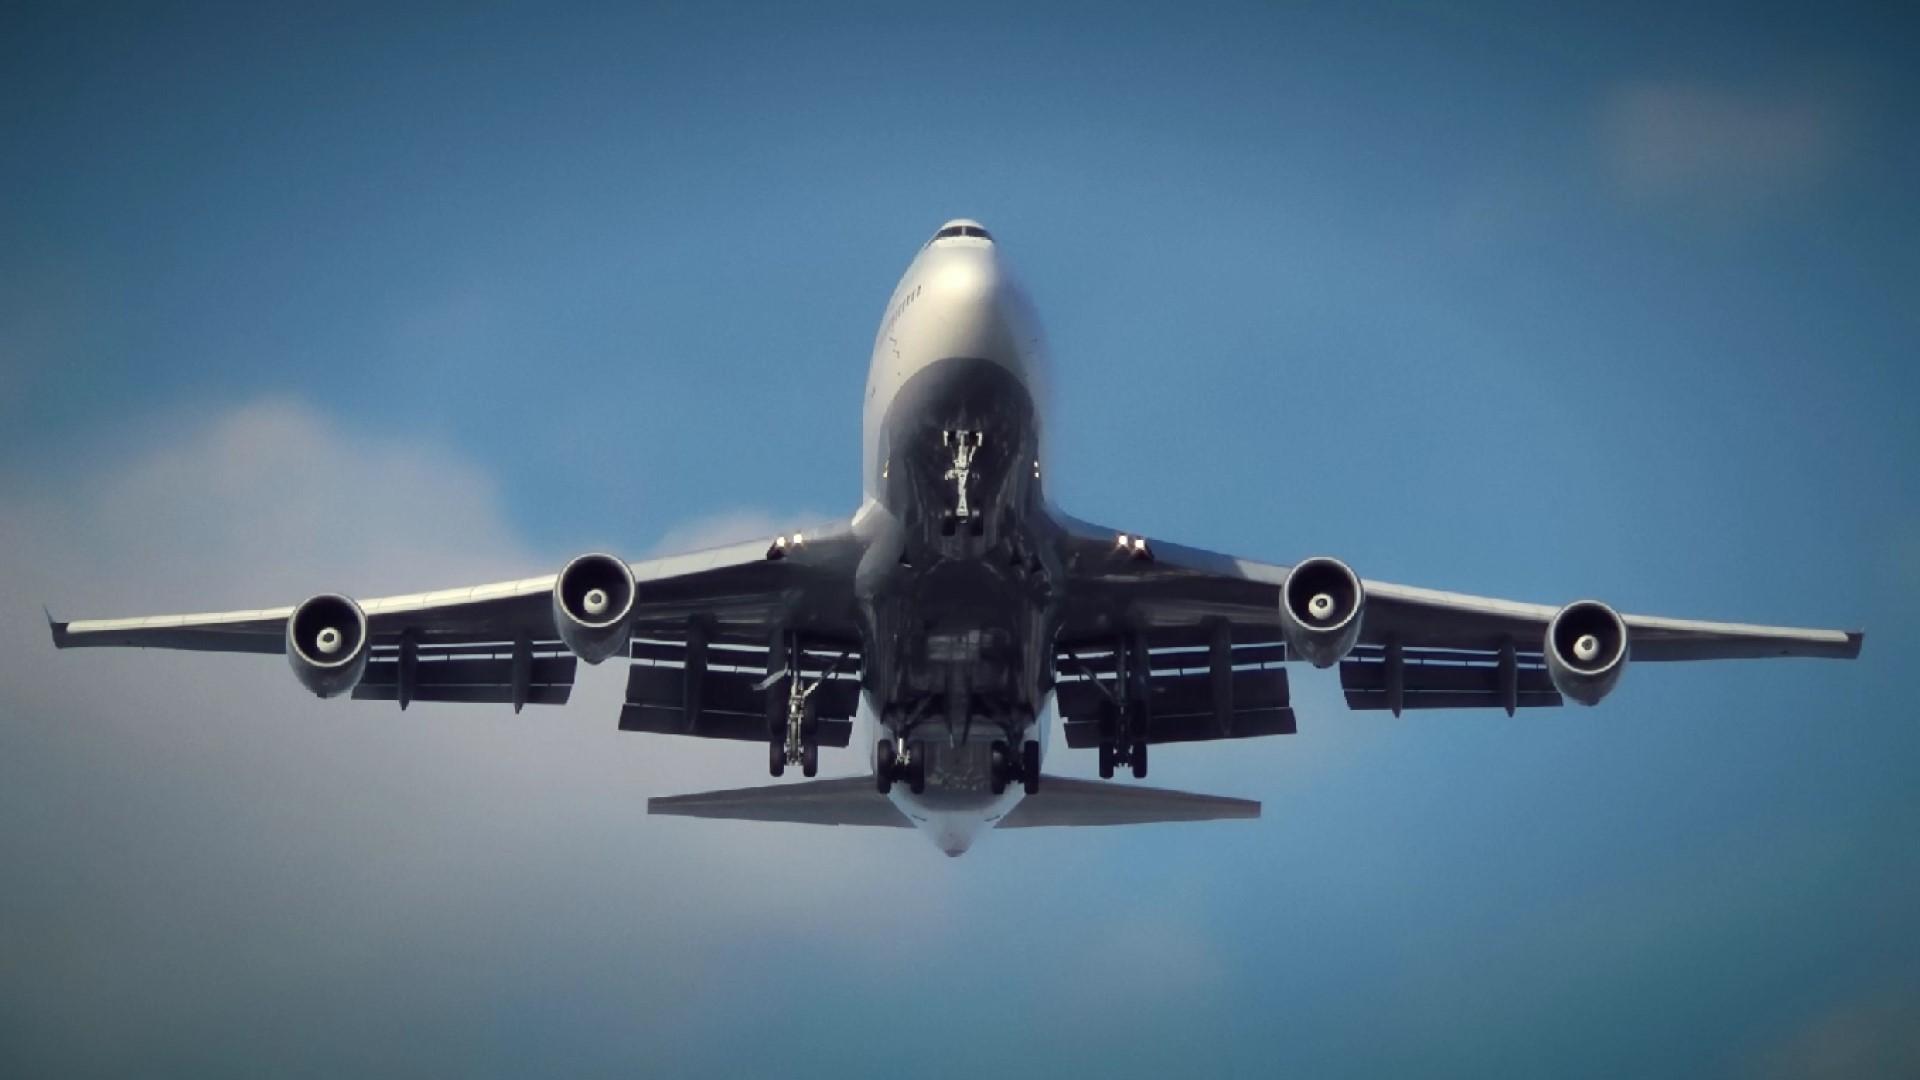 9/11: Four Flights